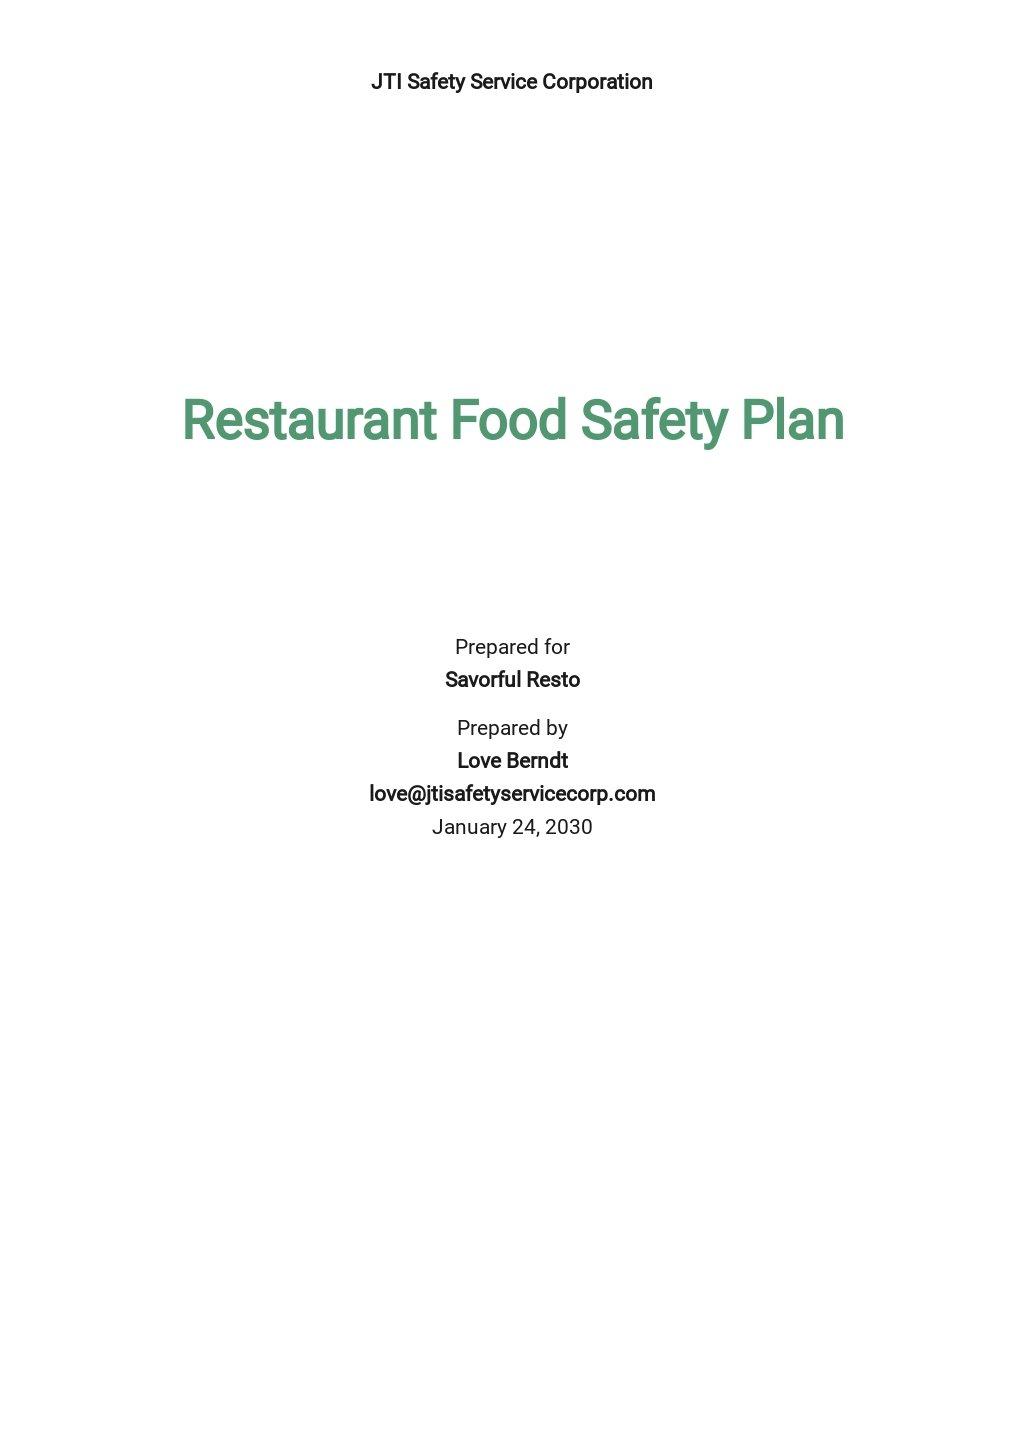 Restaurant Food Safety Plan Template.jpe